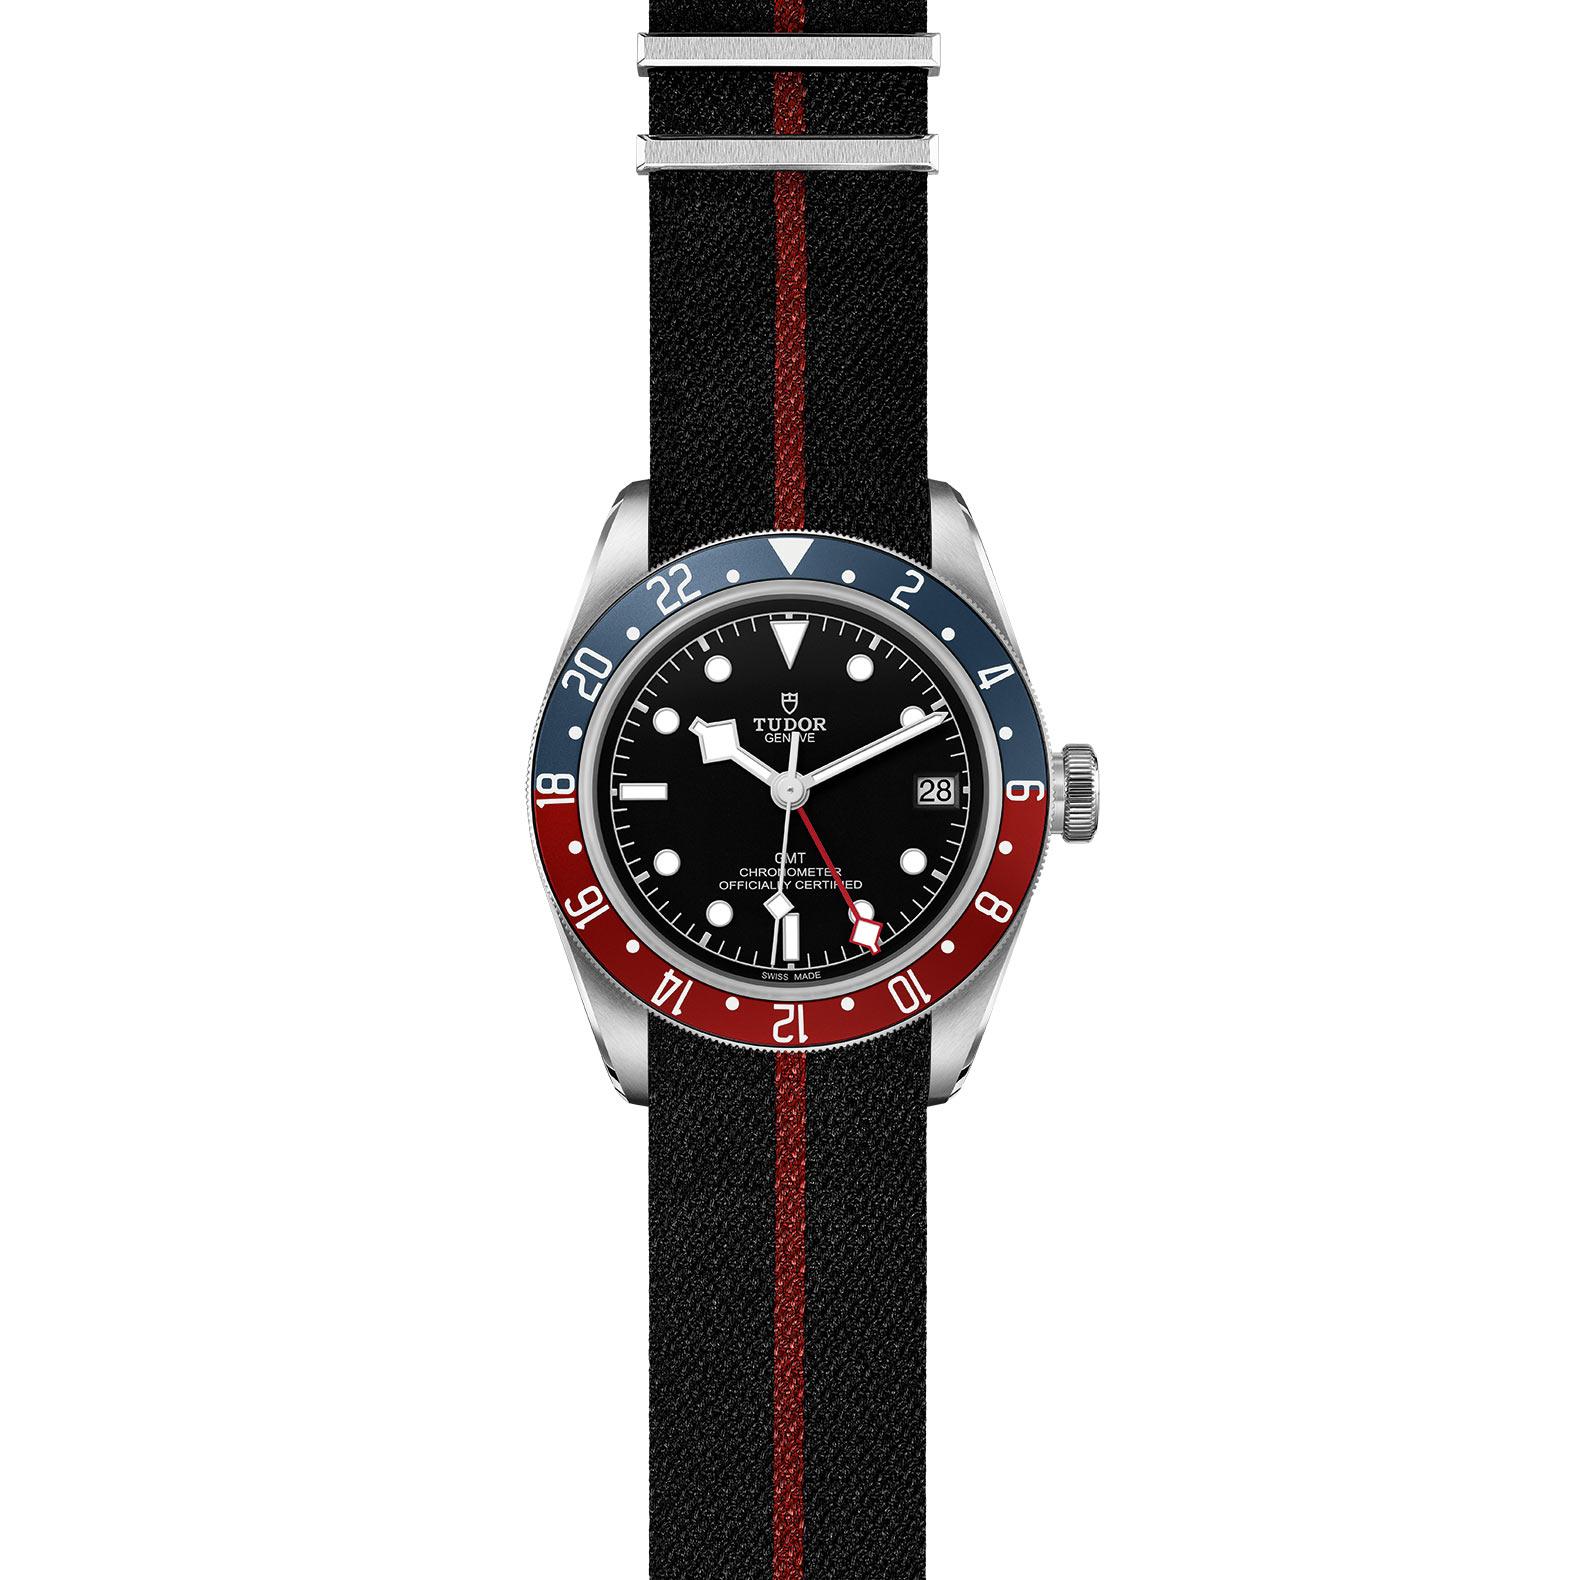 TUDOR Black Bay GMT M79830RB 0003 Frontfacing